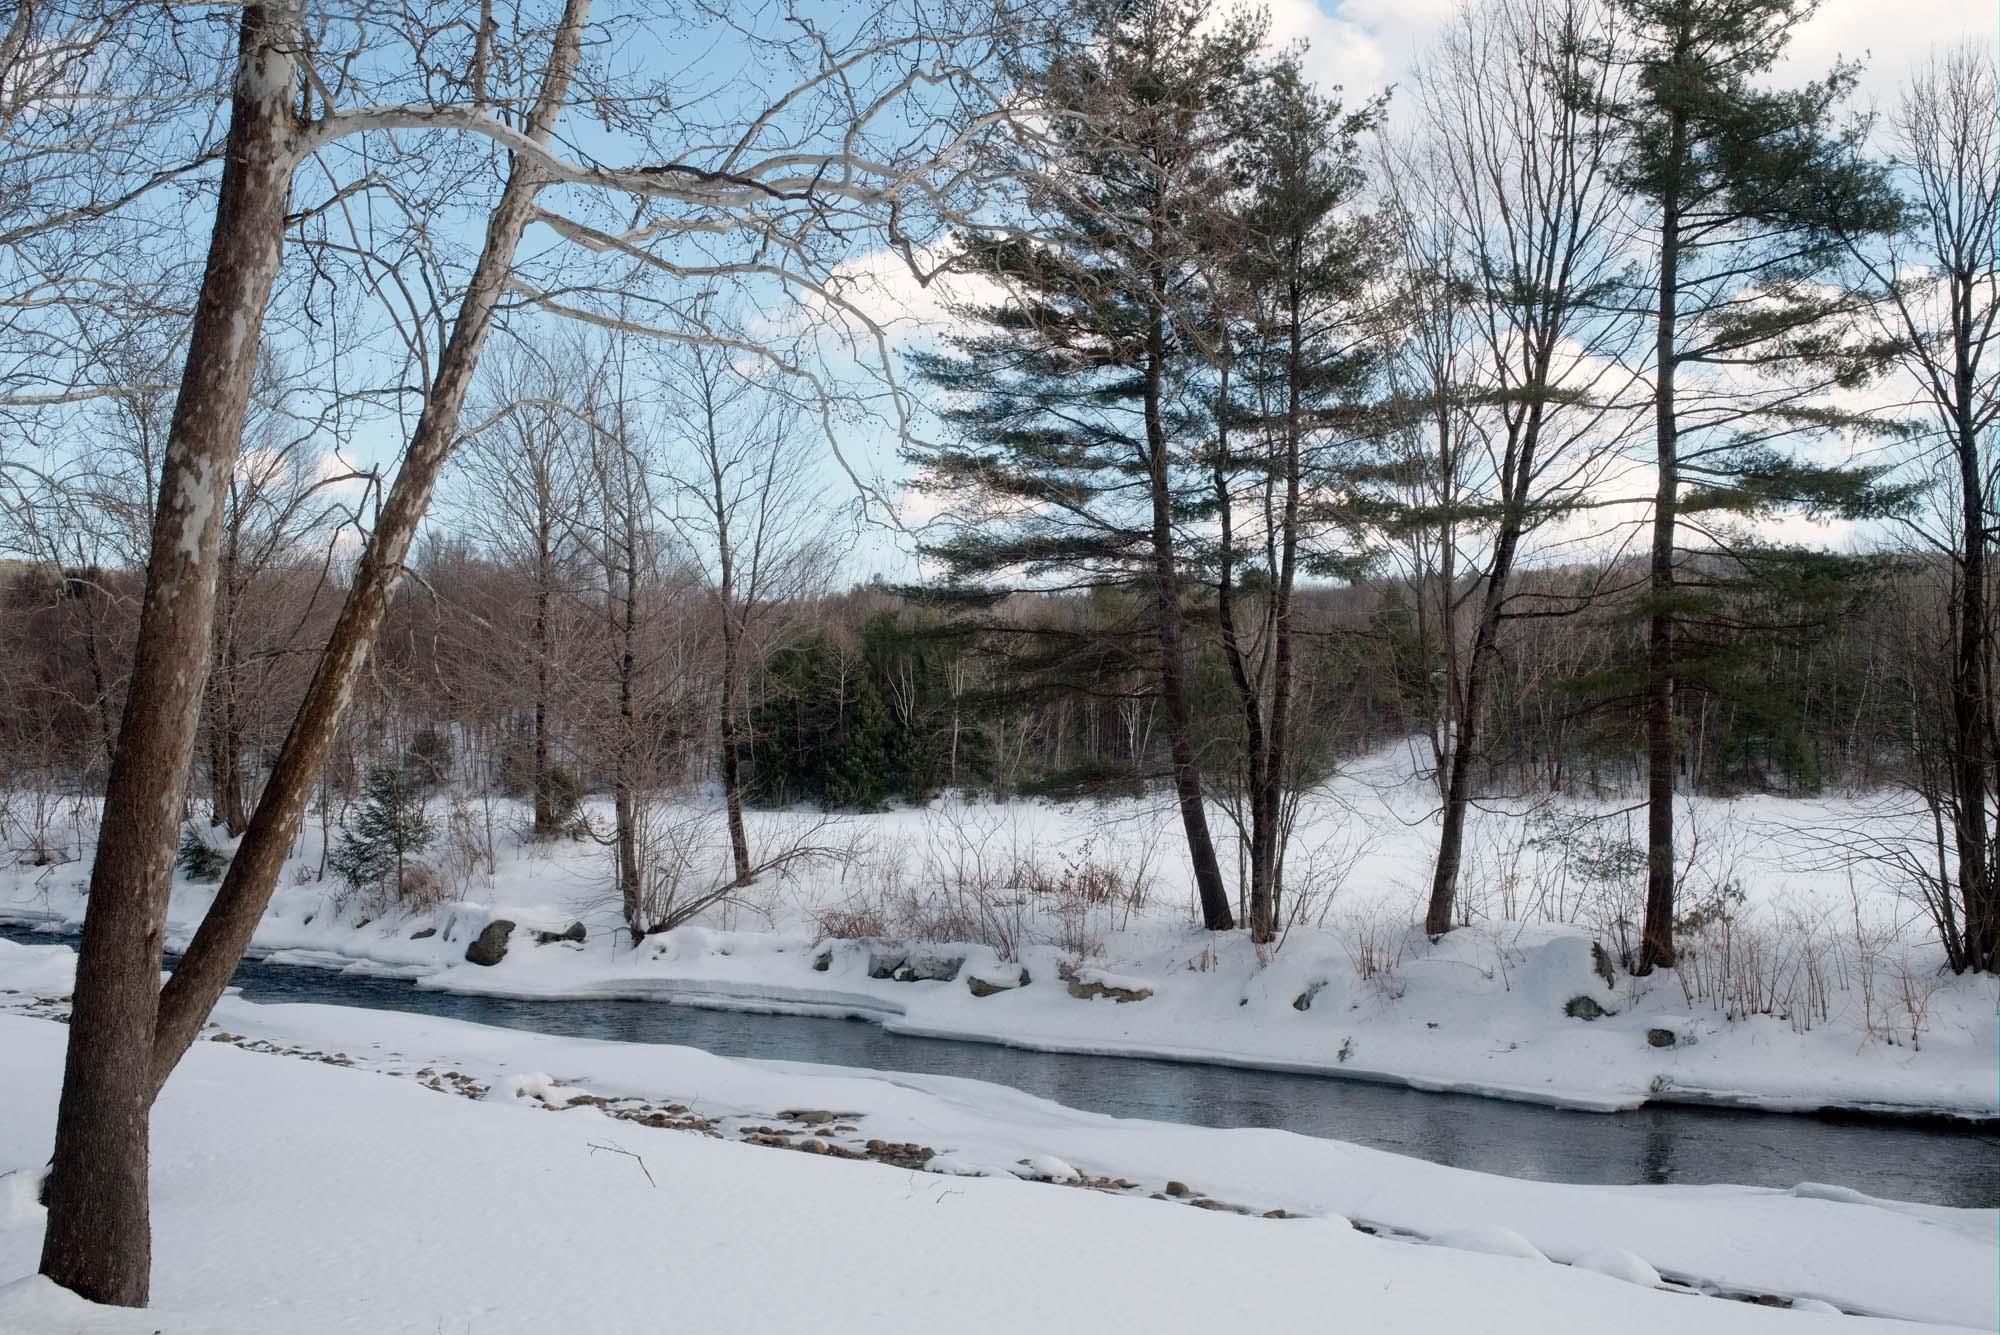 Cold River. Alstead, New Hampshire, USA. March 2015.